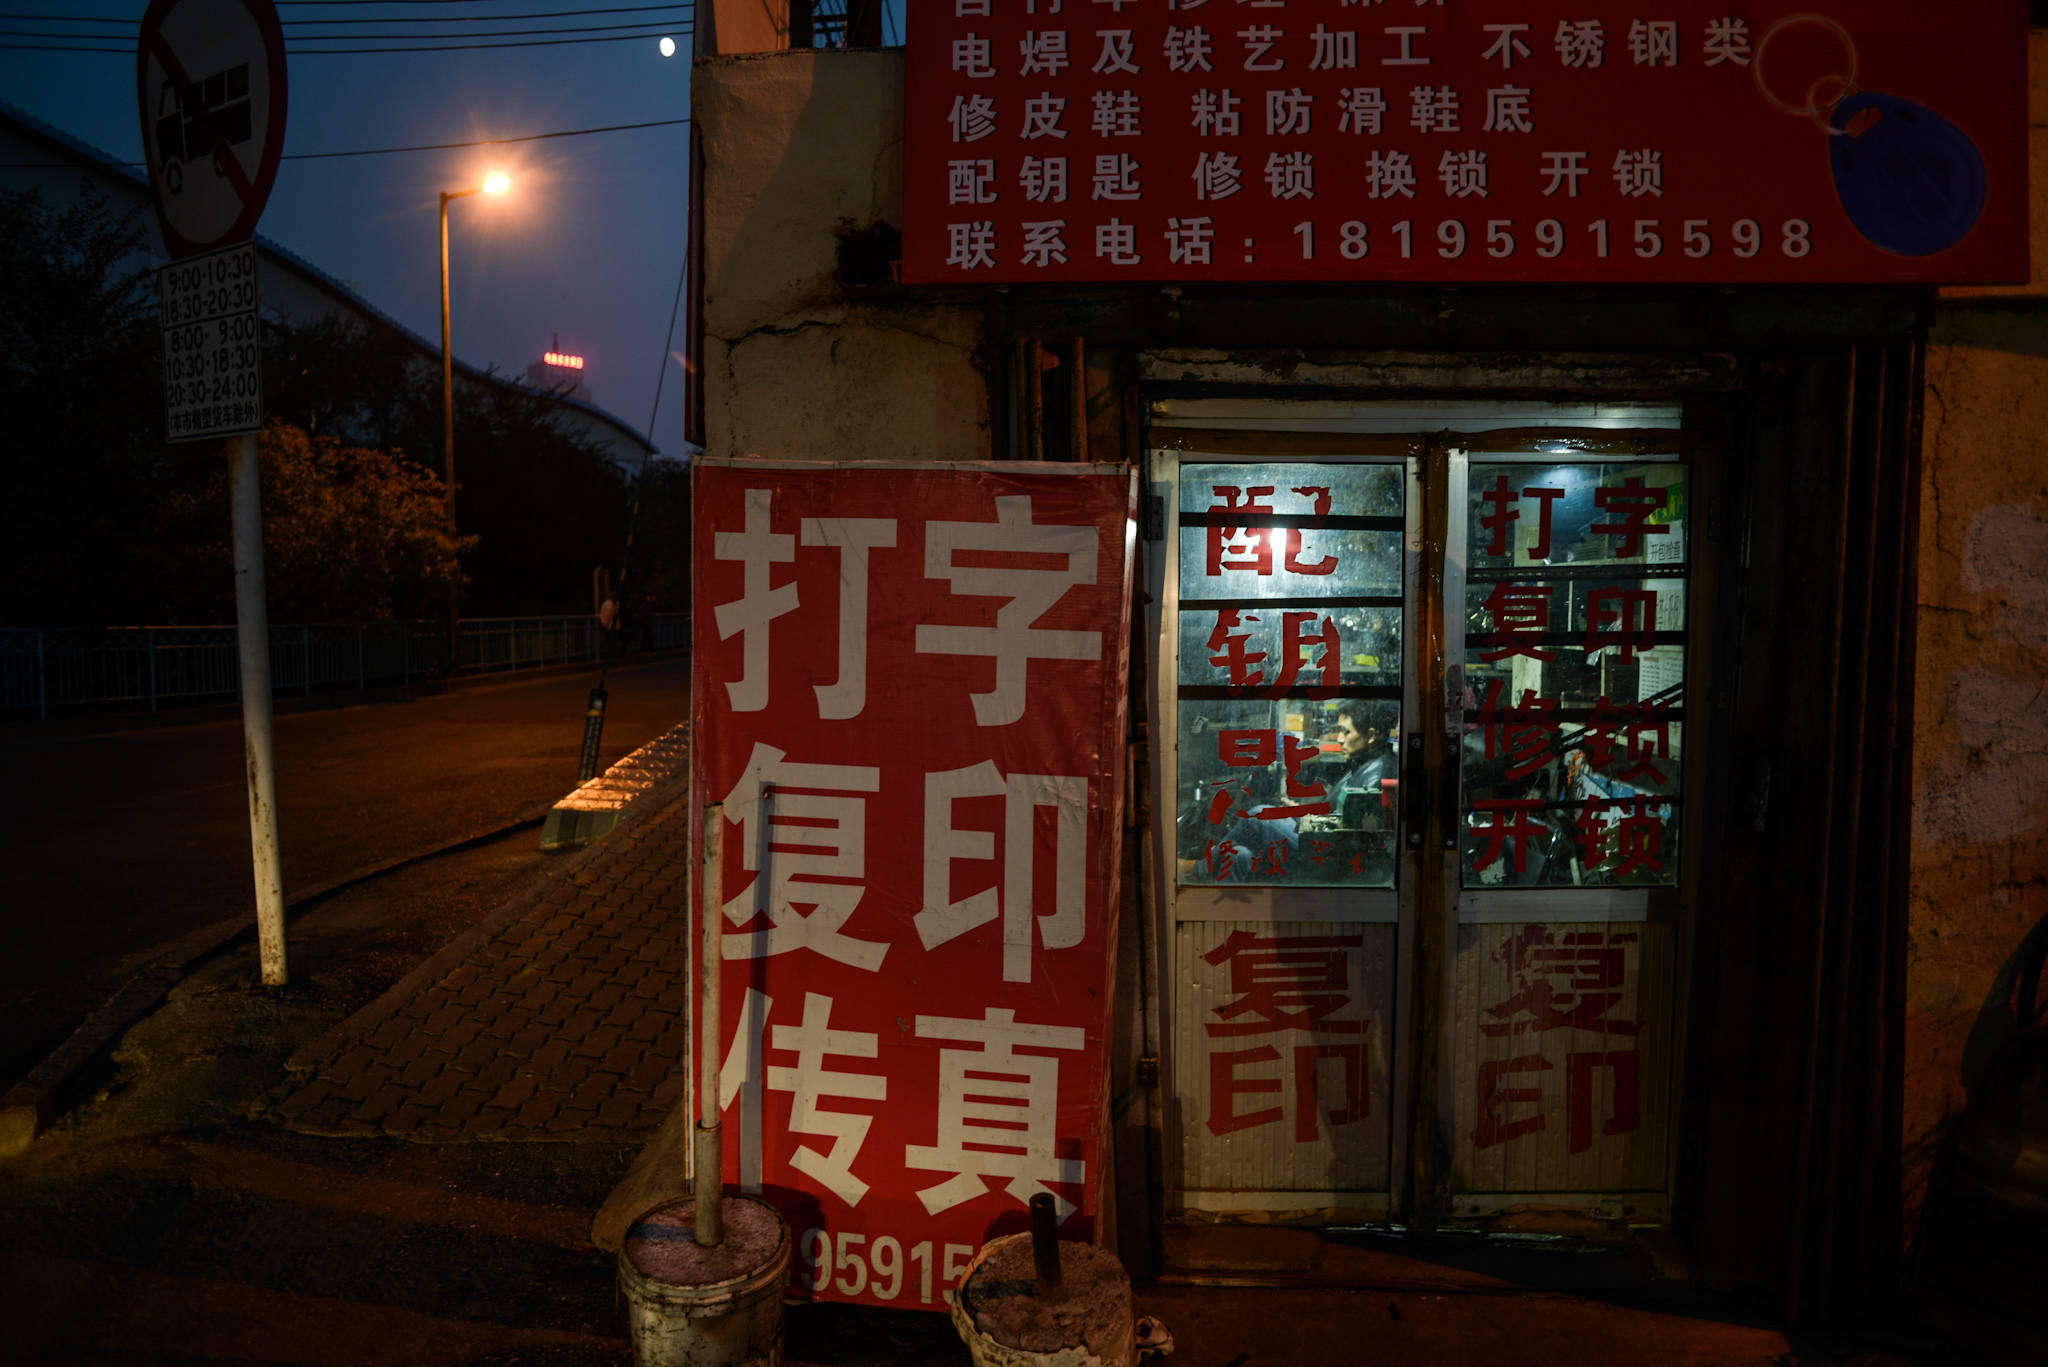 Chinexiang